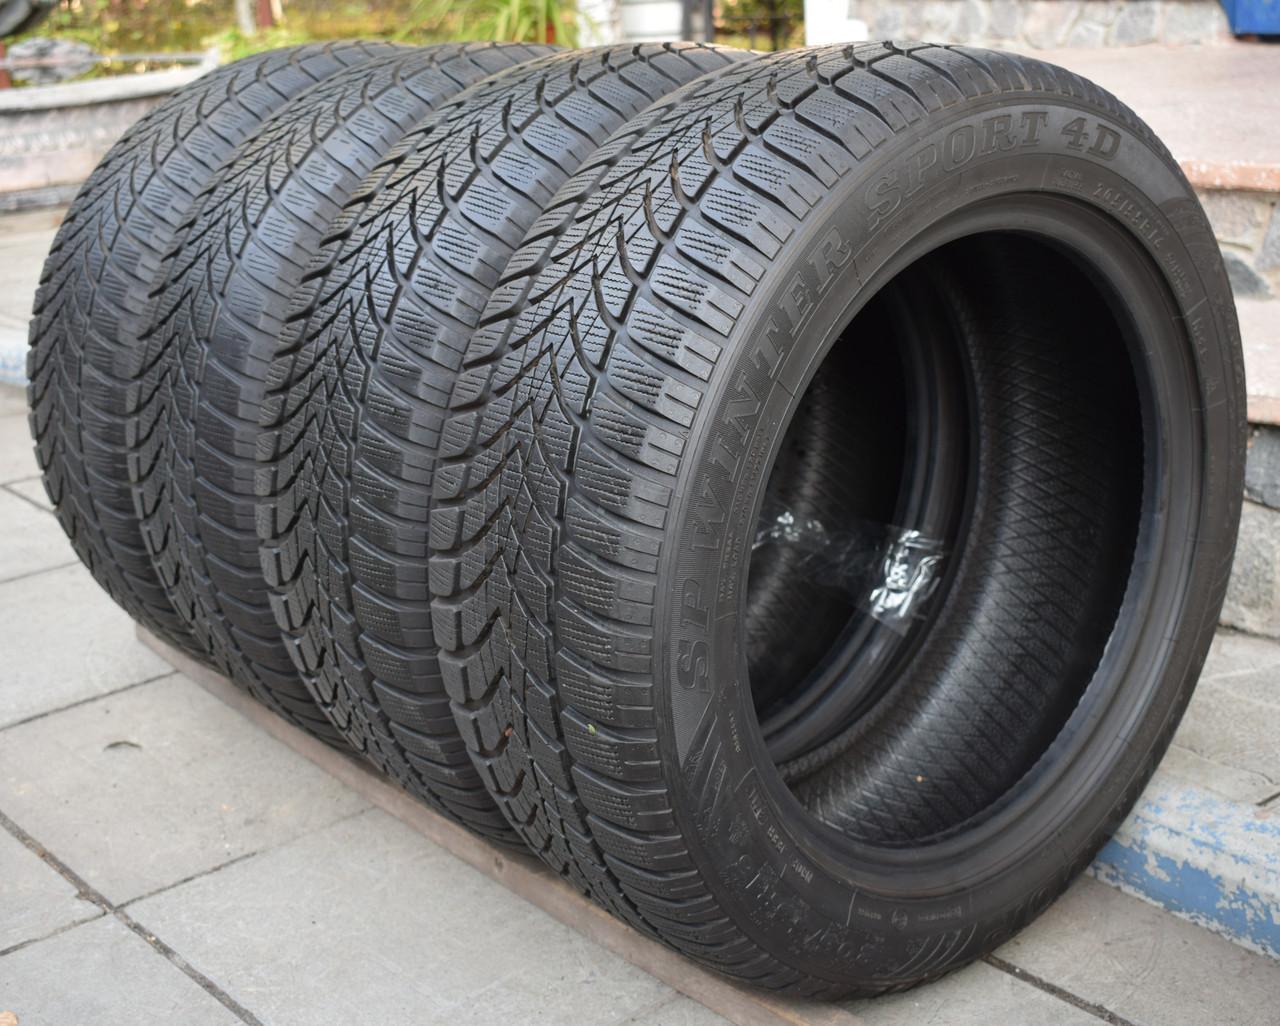 Шины б/у 205/55 R16 Dunlop SP Winter Sport 3D, ЗИМА, 6 мм, комплект